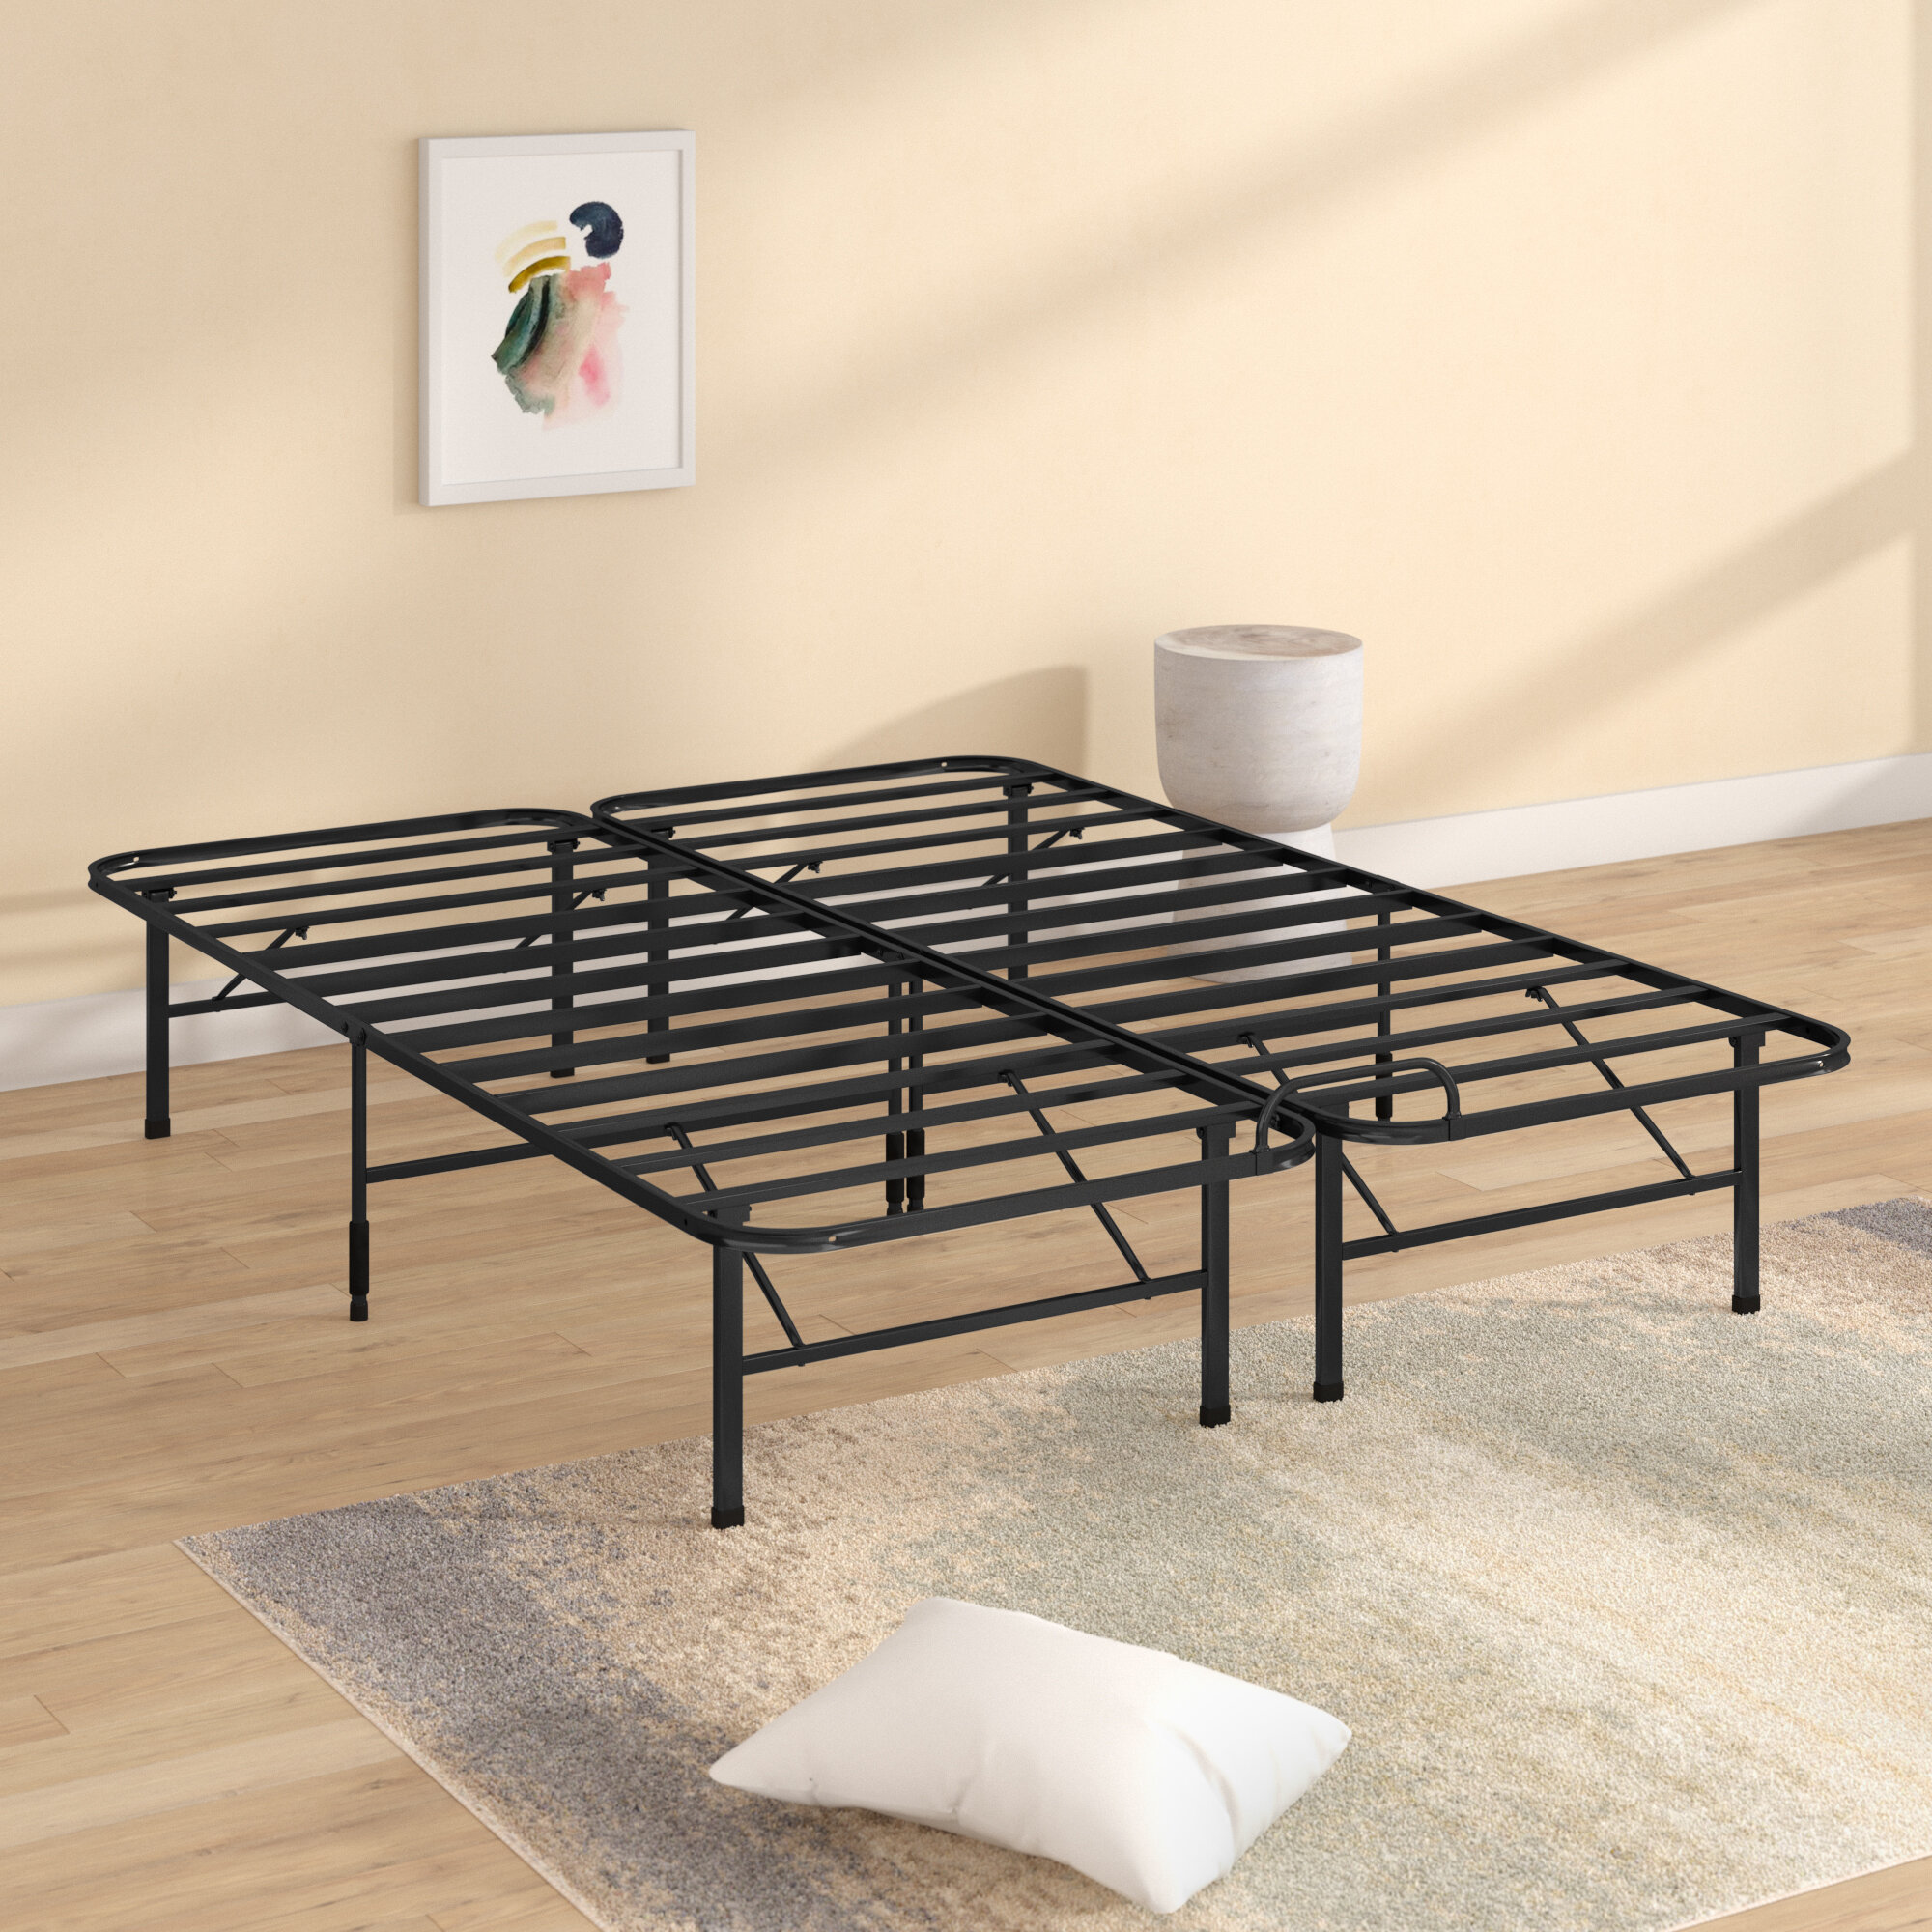 Alwyn Home Smart Base Select Stopper Bed Frame U0026 Reviews | Wayfair